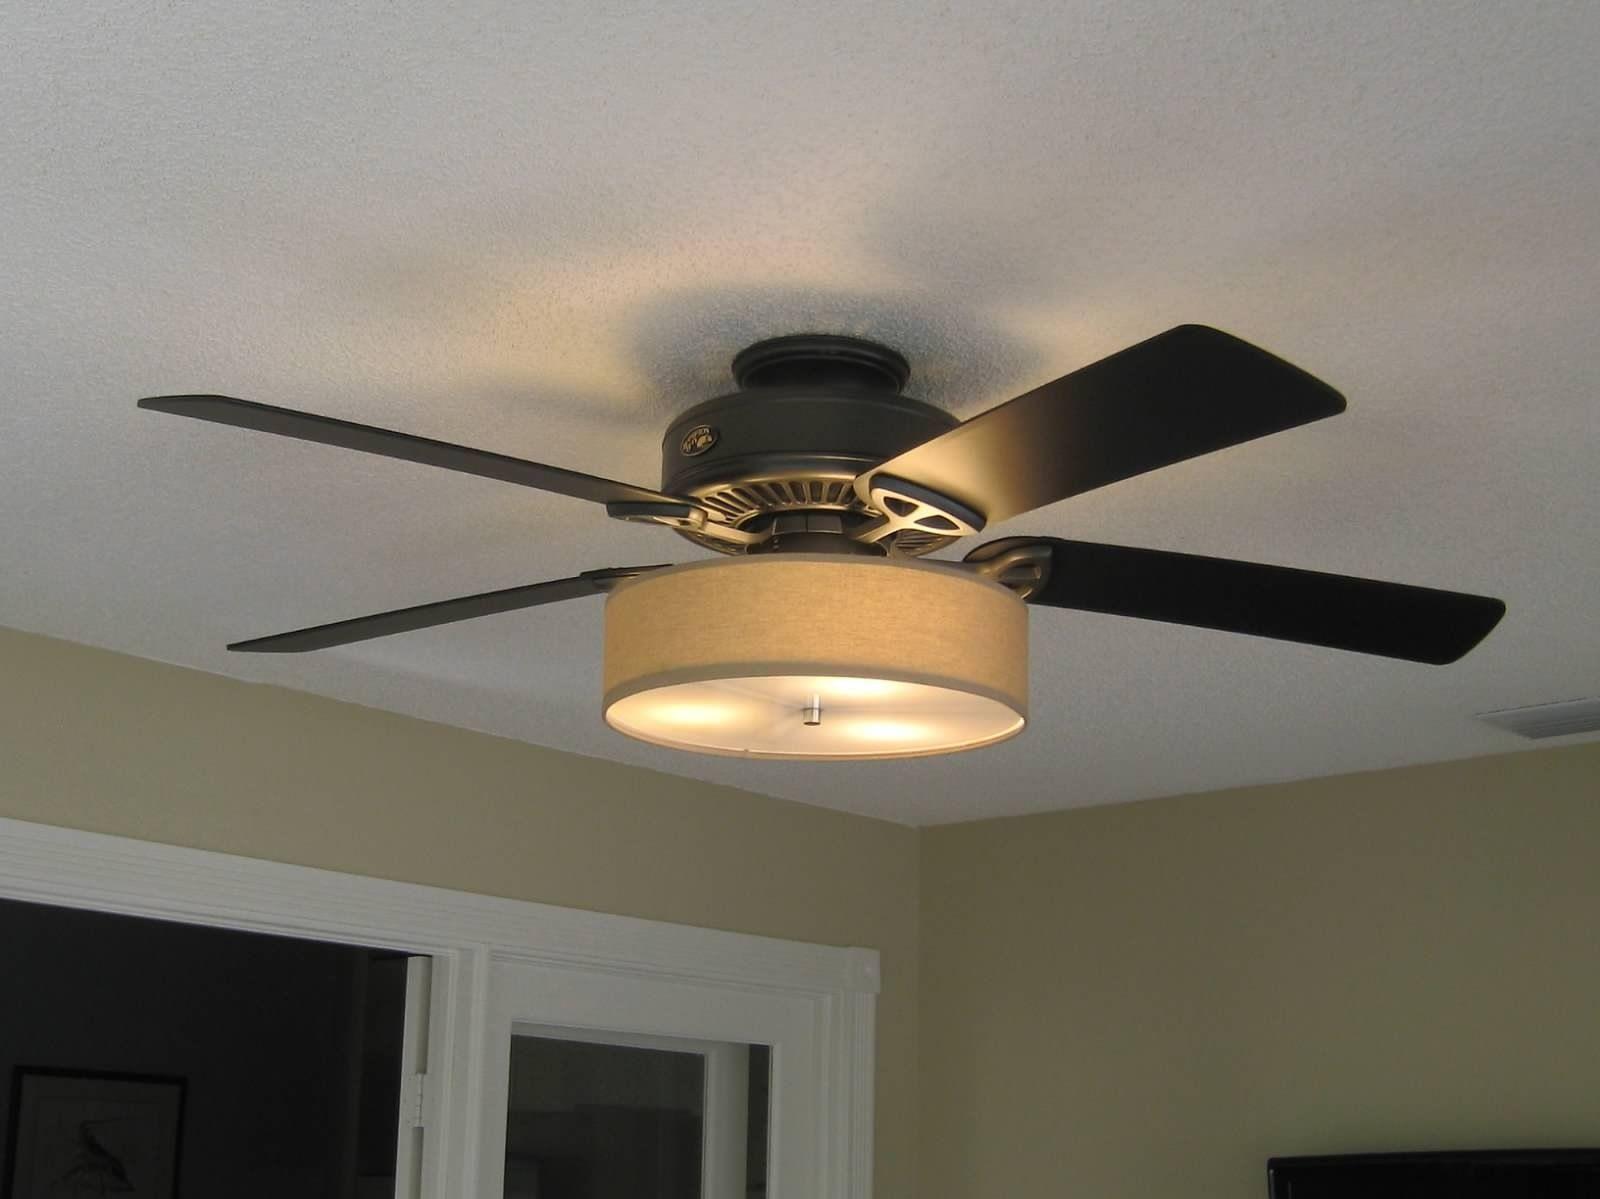 Hunter ceiling fan light shades httpcreativechairsandtables ceiling hunter ceiling fan light shades aloadofball Choice Image